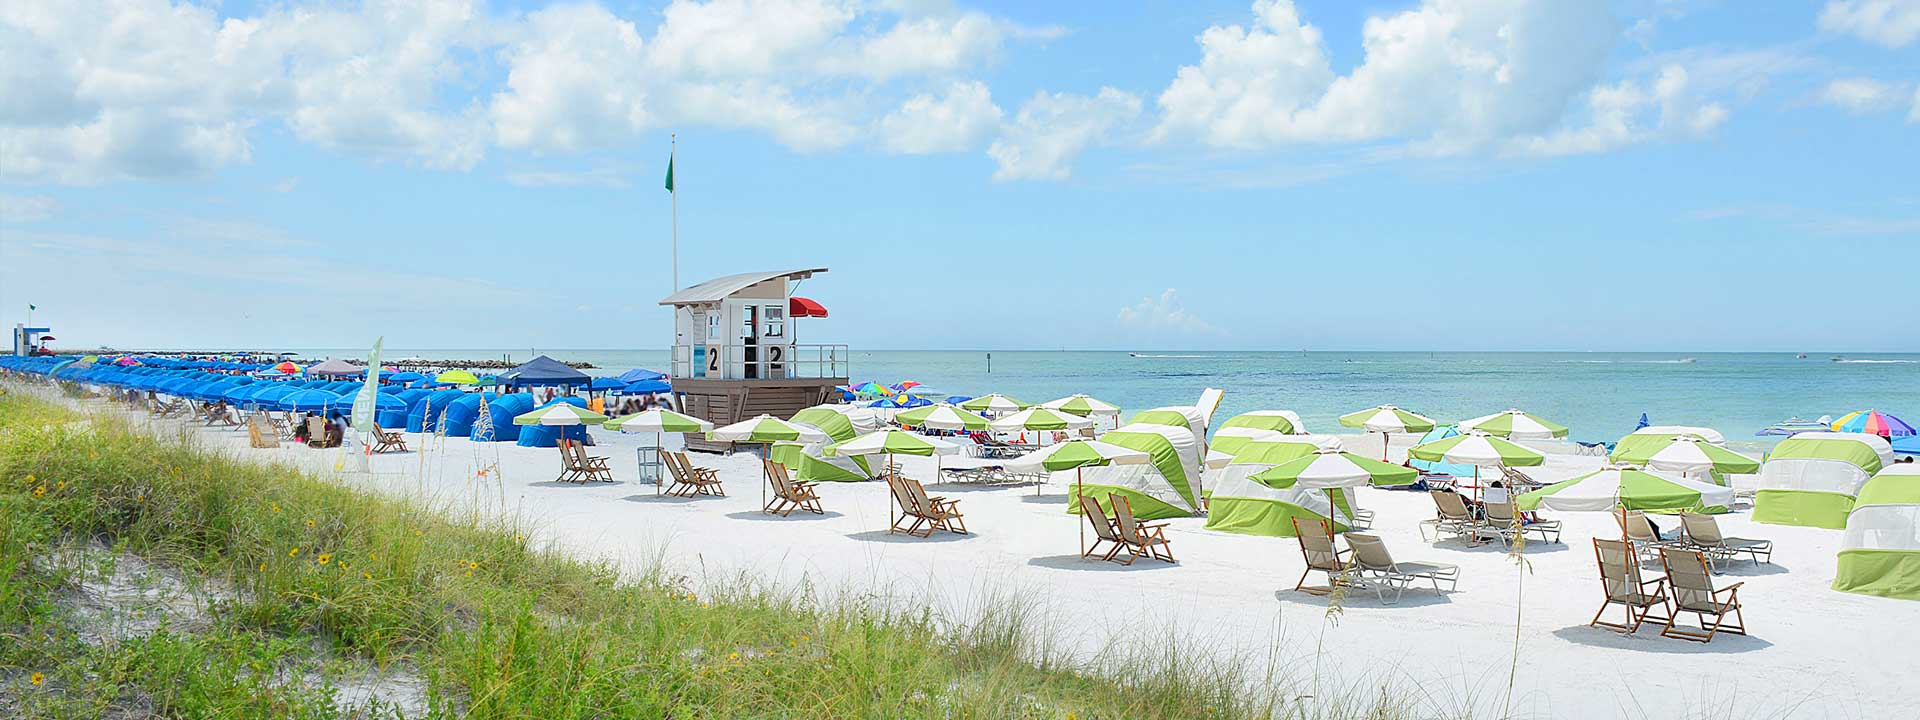 The Best Beaches Near Orlando   Family Beach Near Orlando